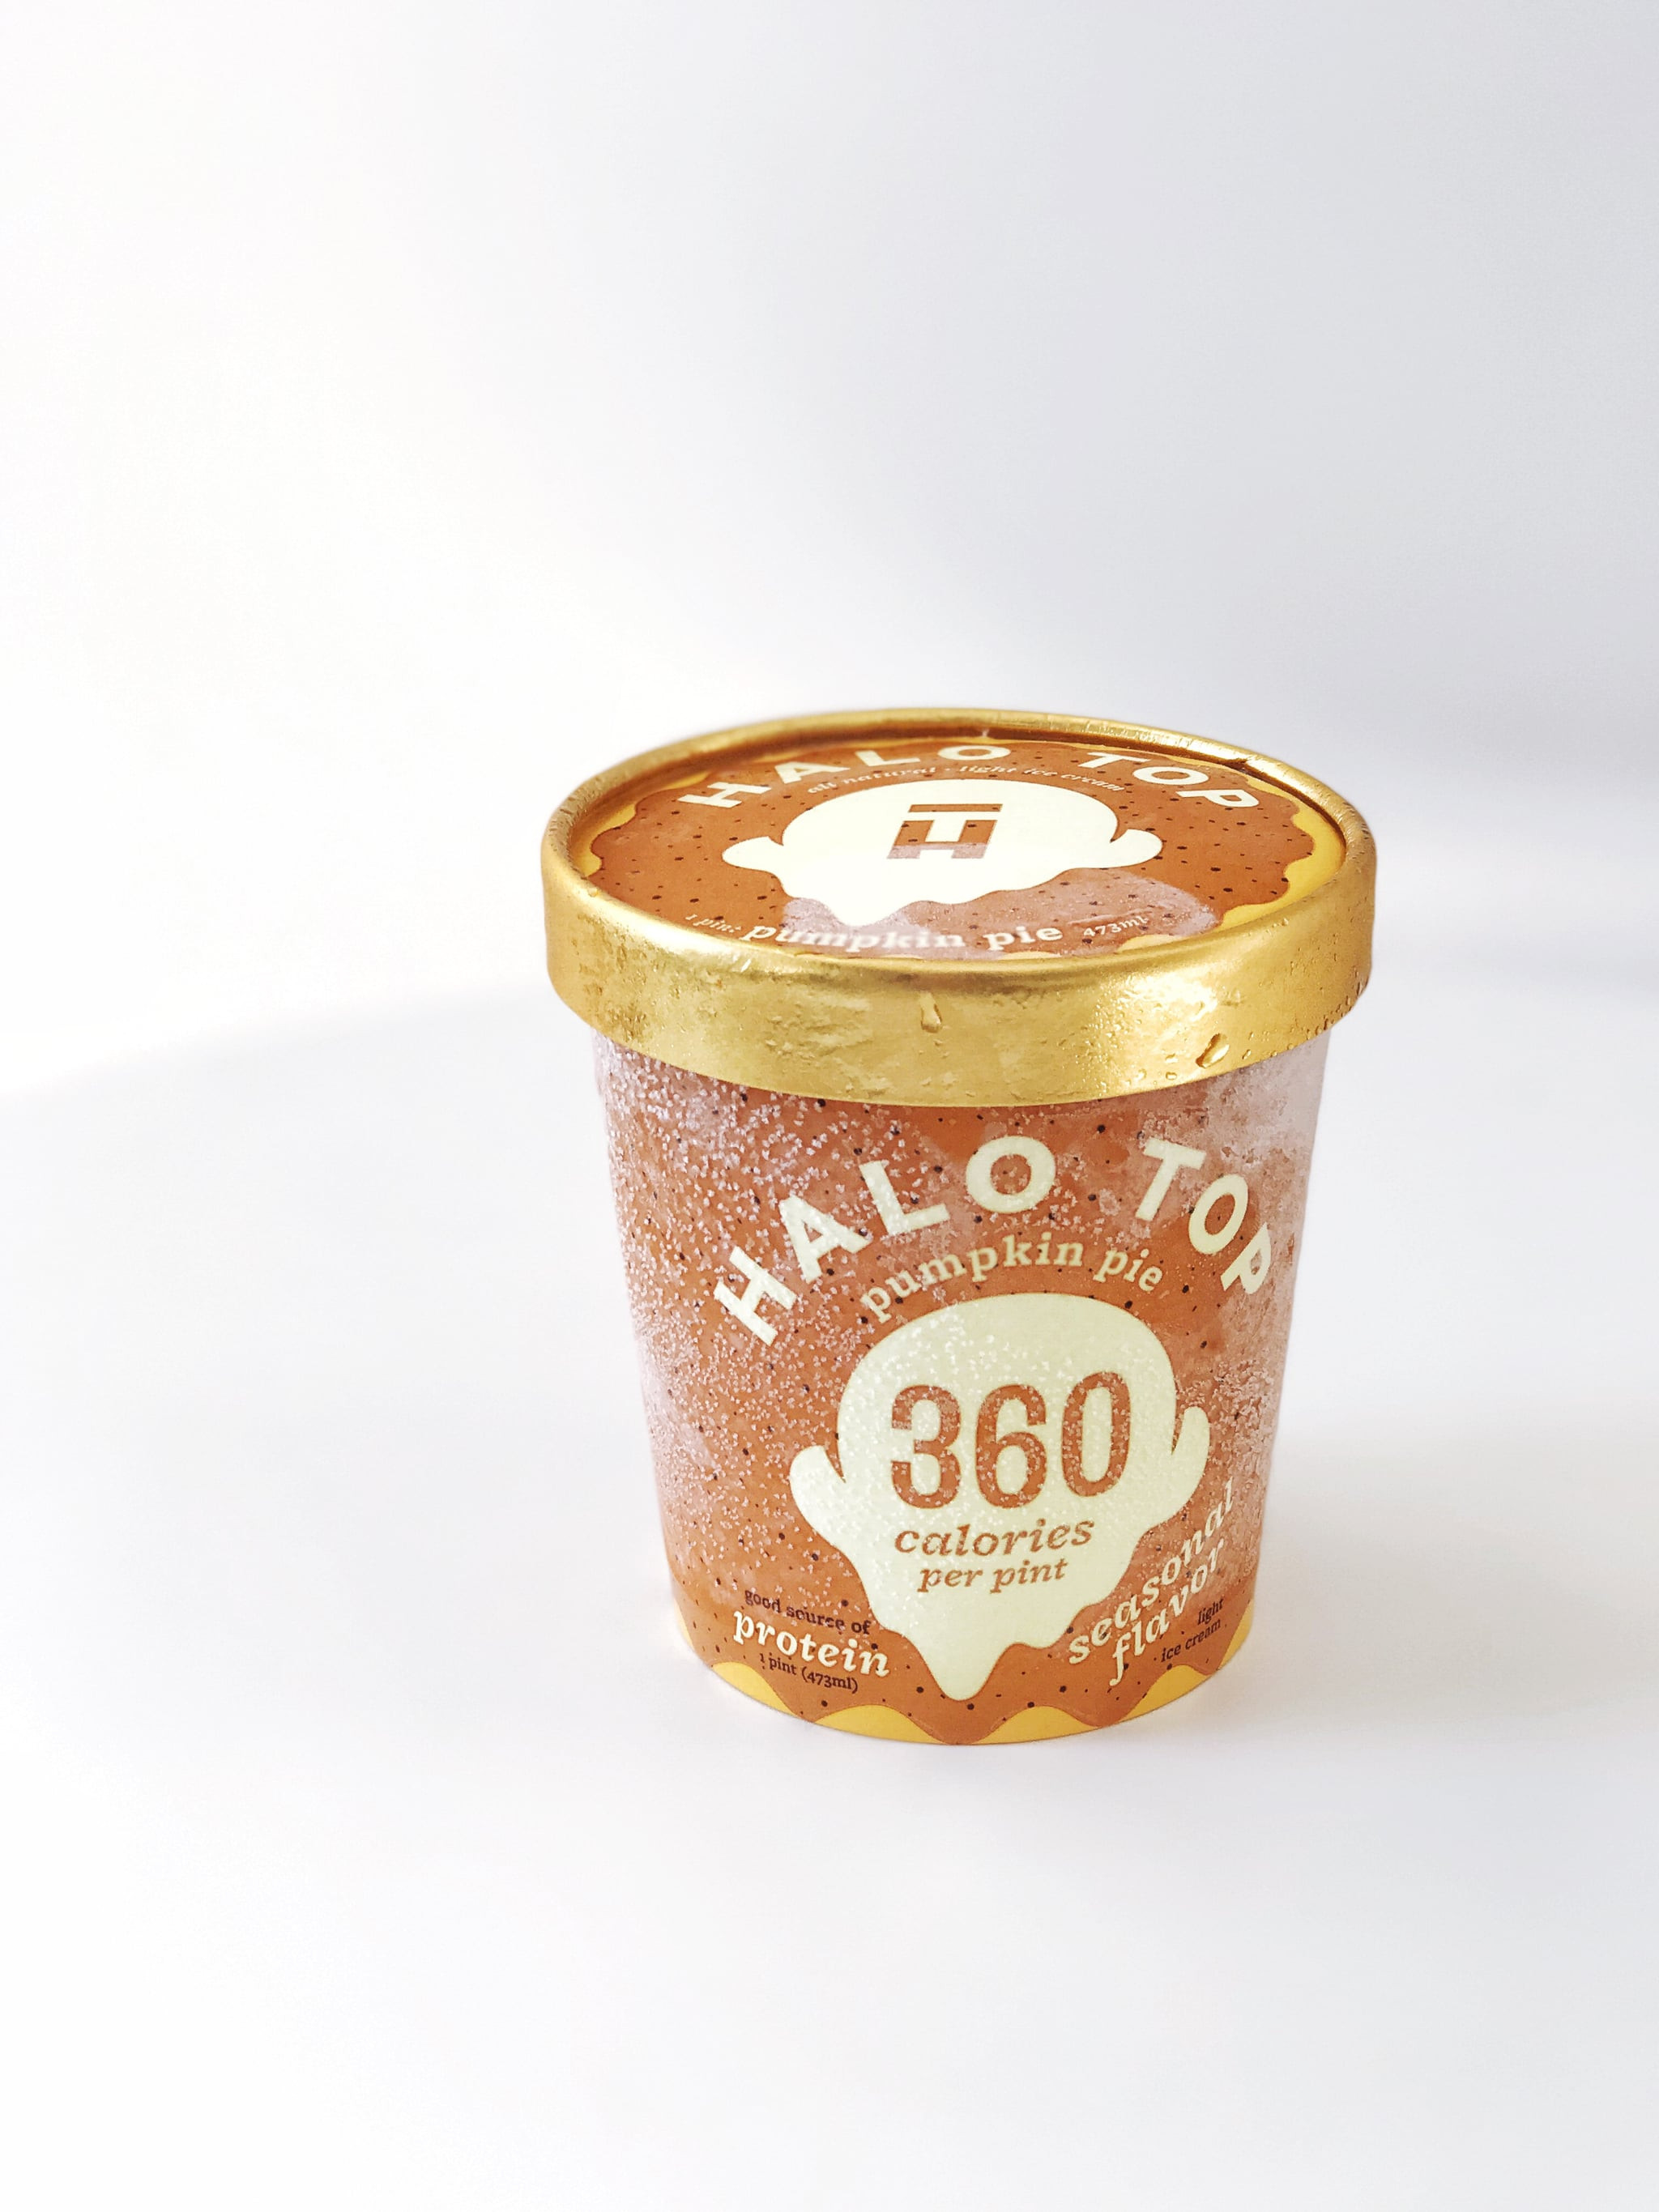 Halo Top Pumpkin Pie  Halo Top Pumpkin Pie Healthy Ice Cream